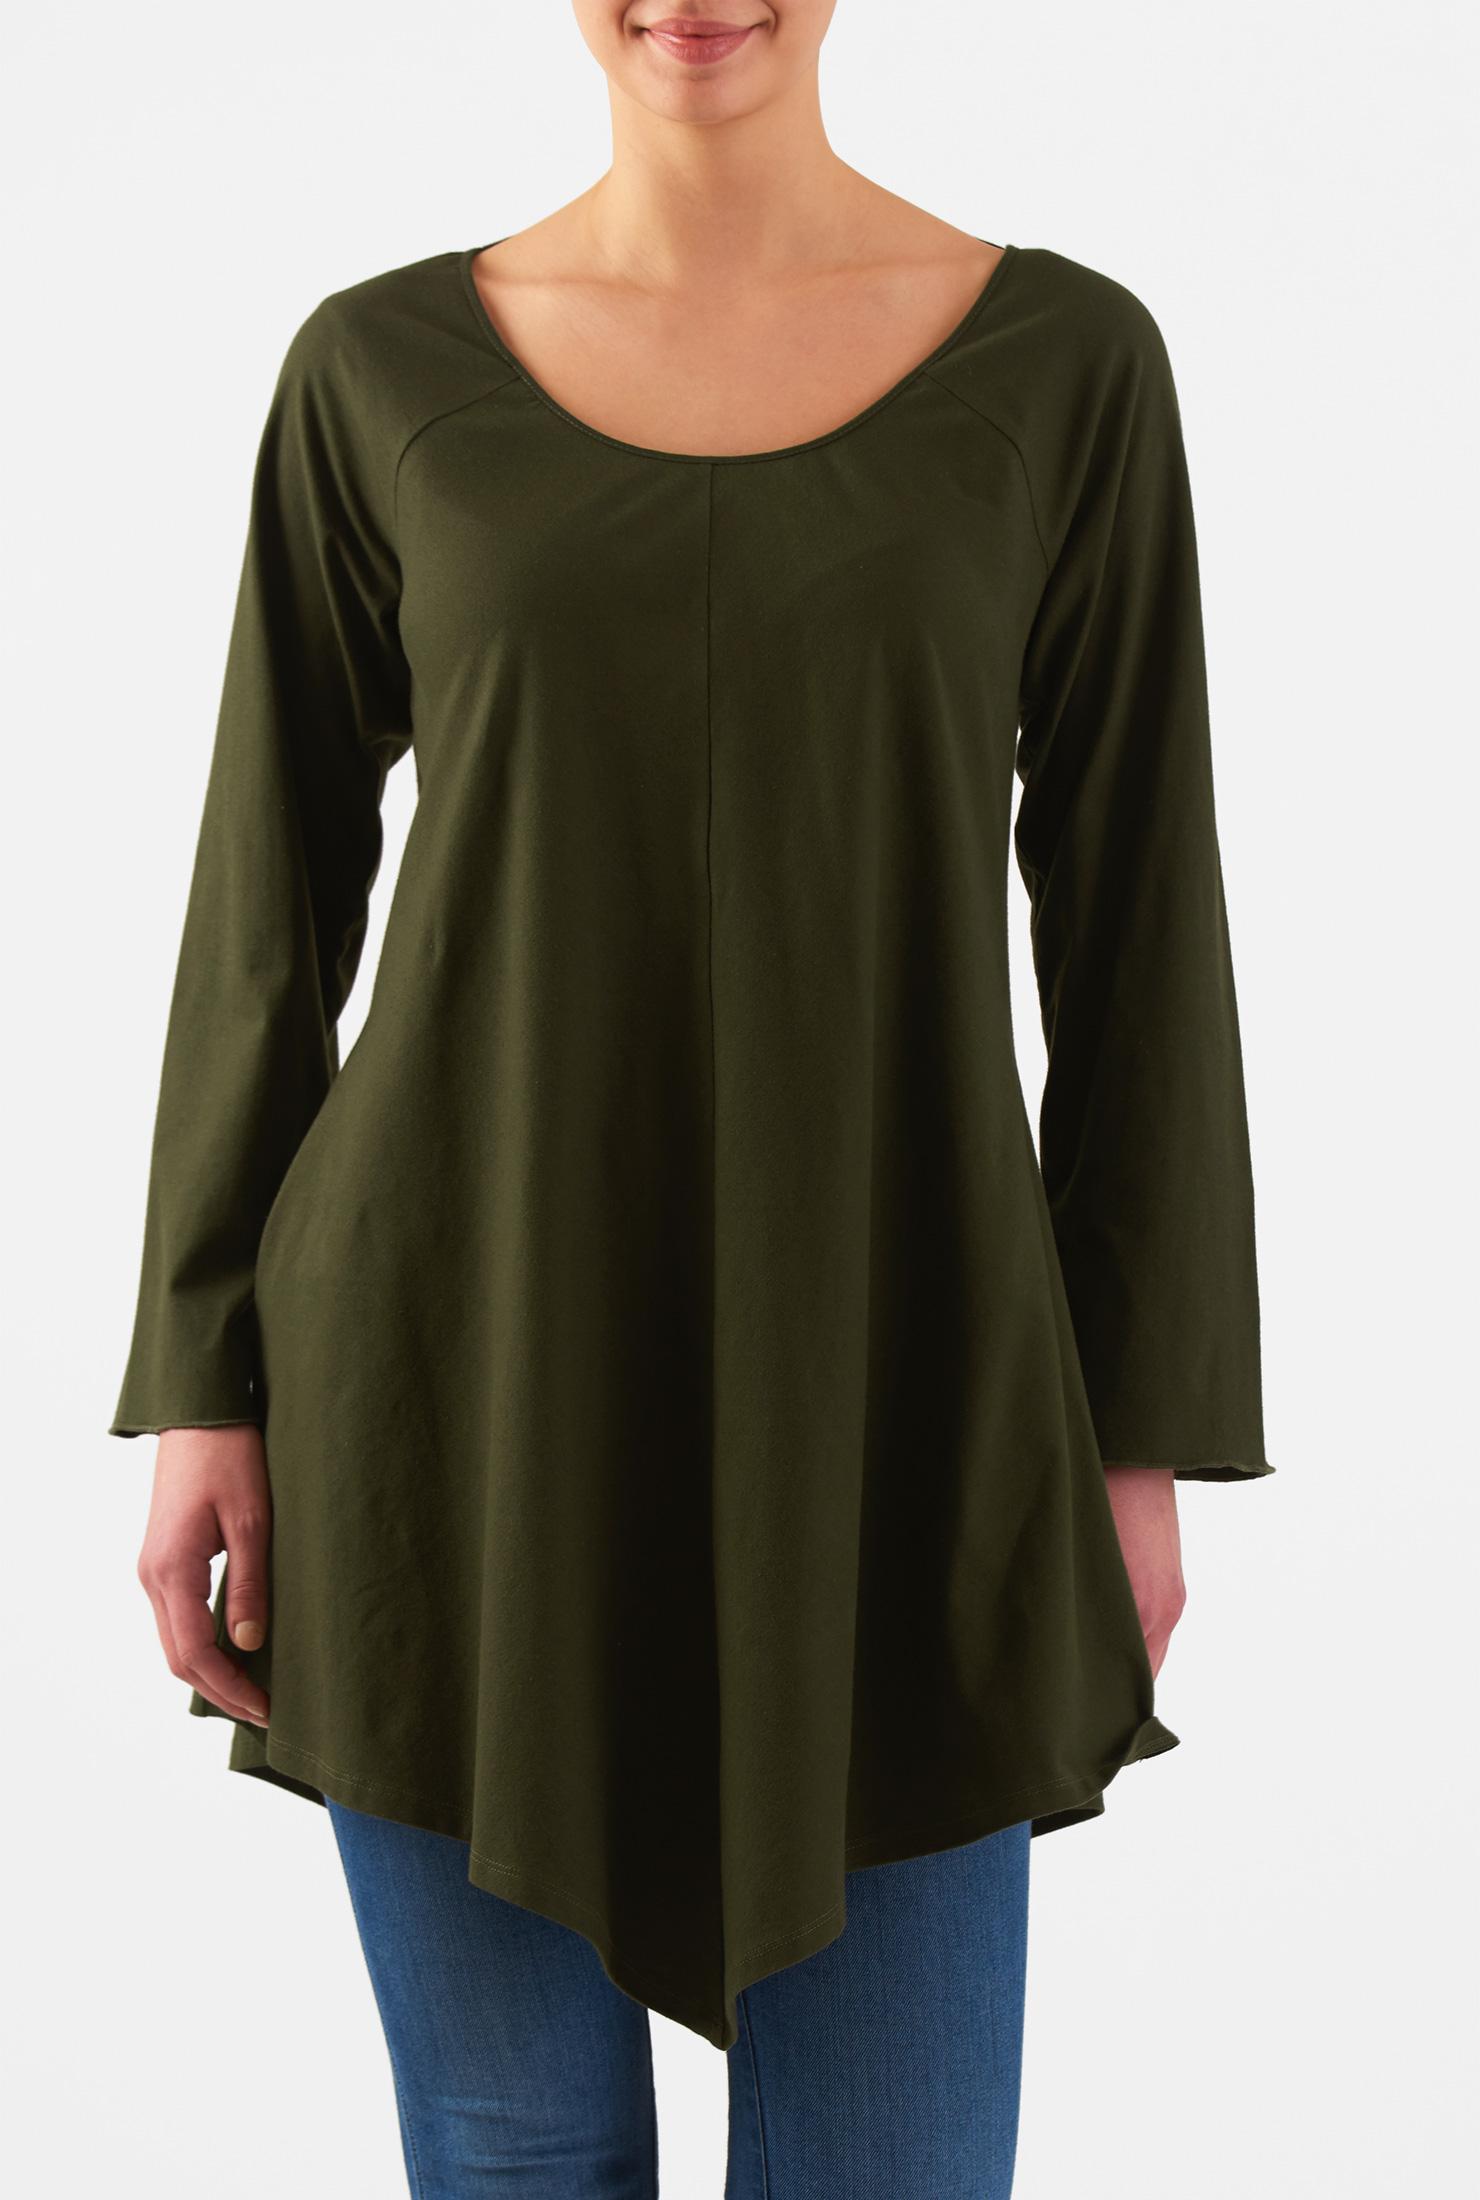 Image of eShakti Women's Angled hem cotton knit tunic